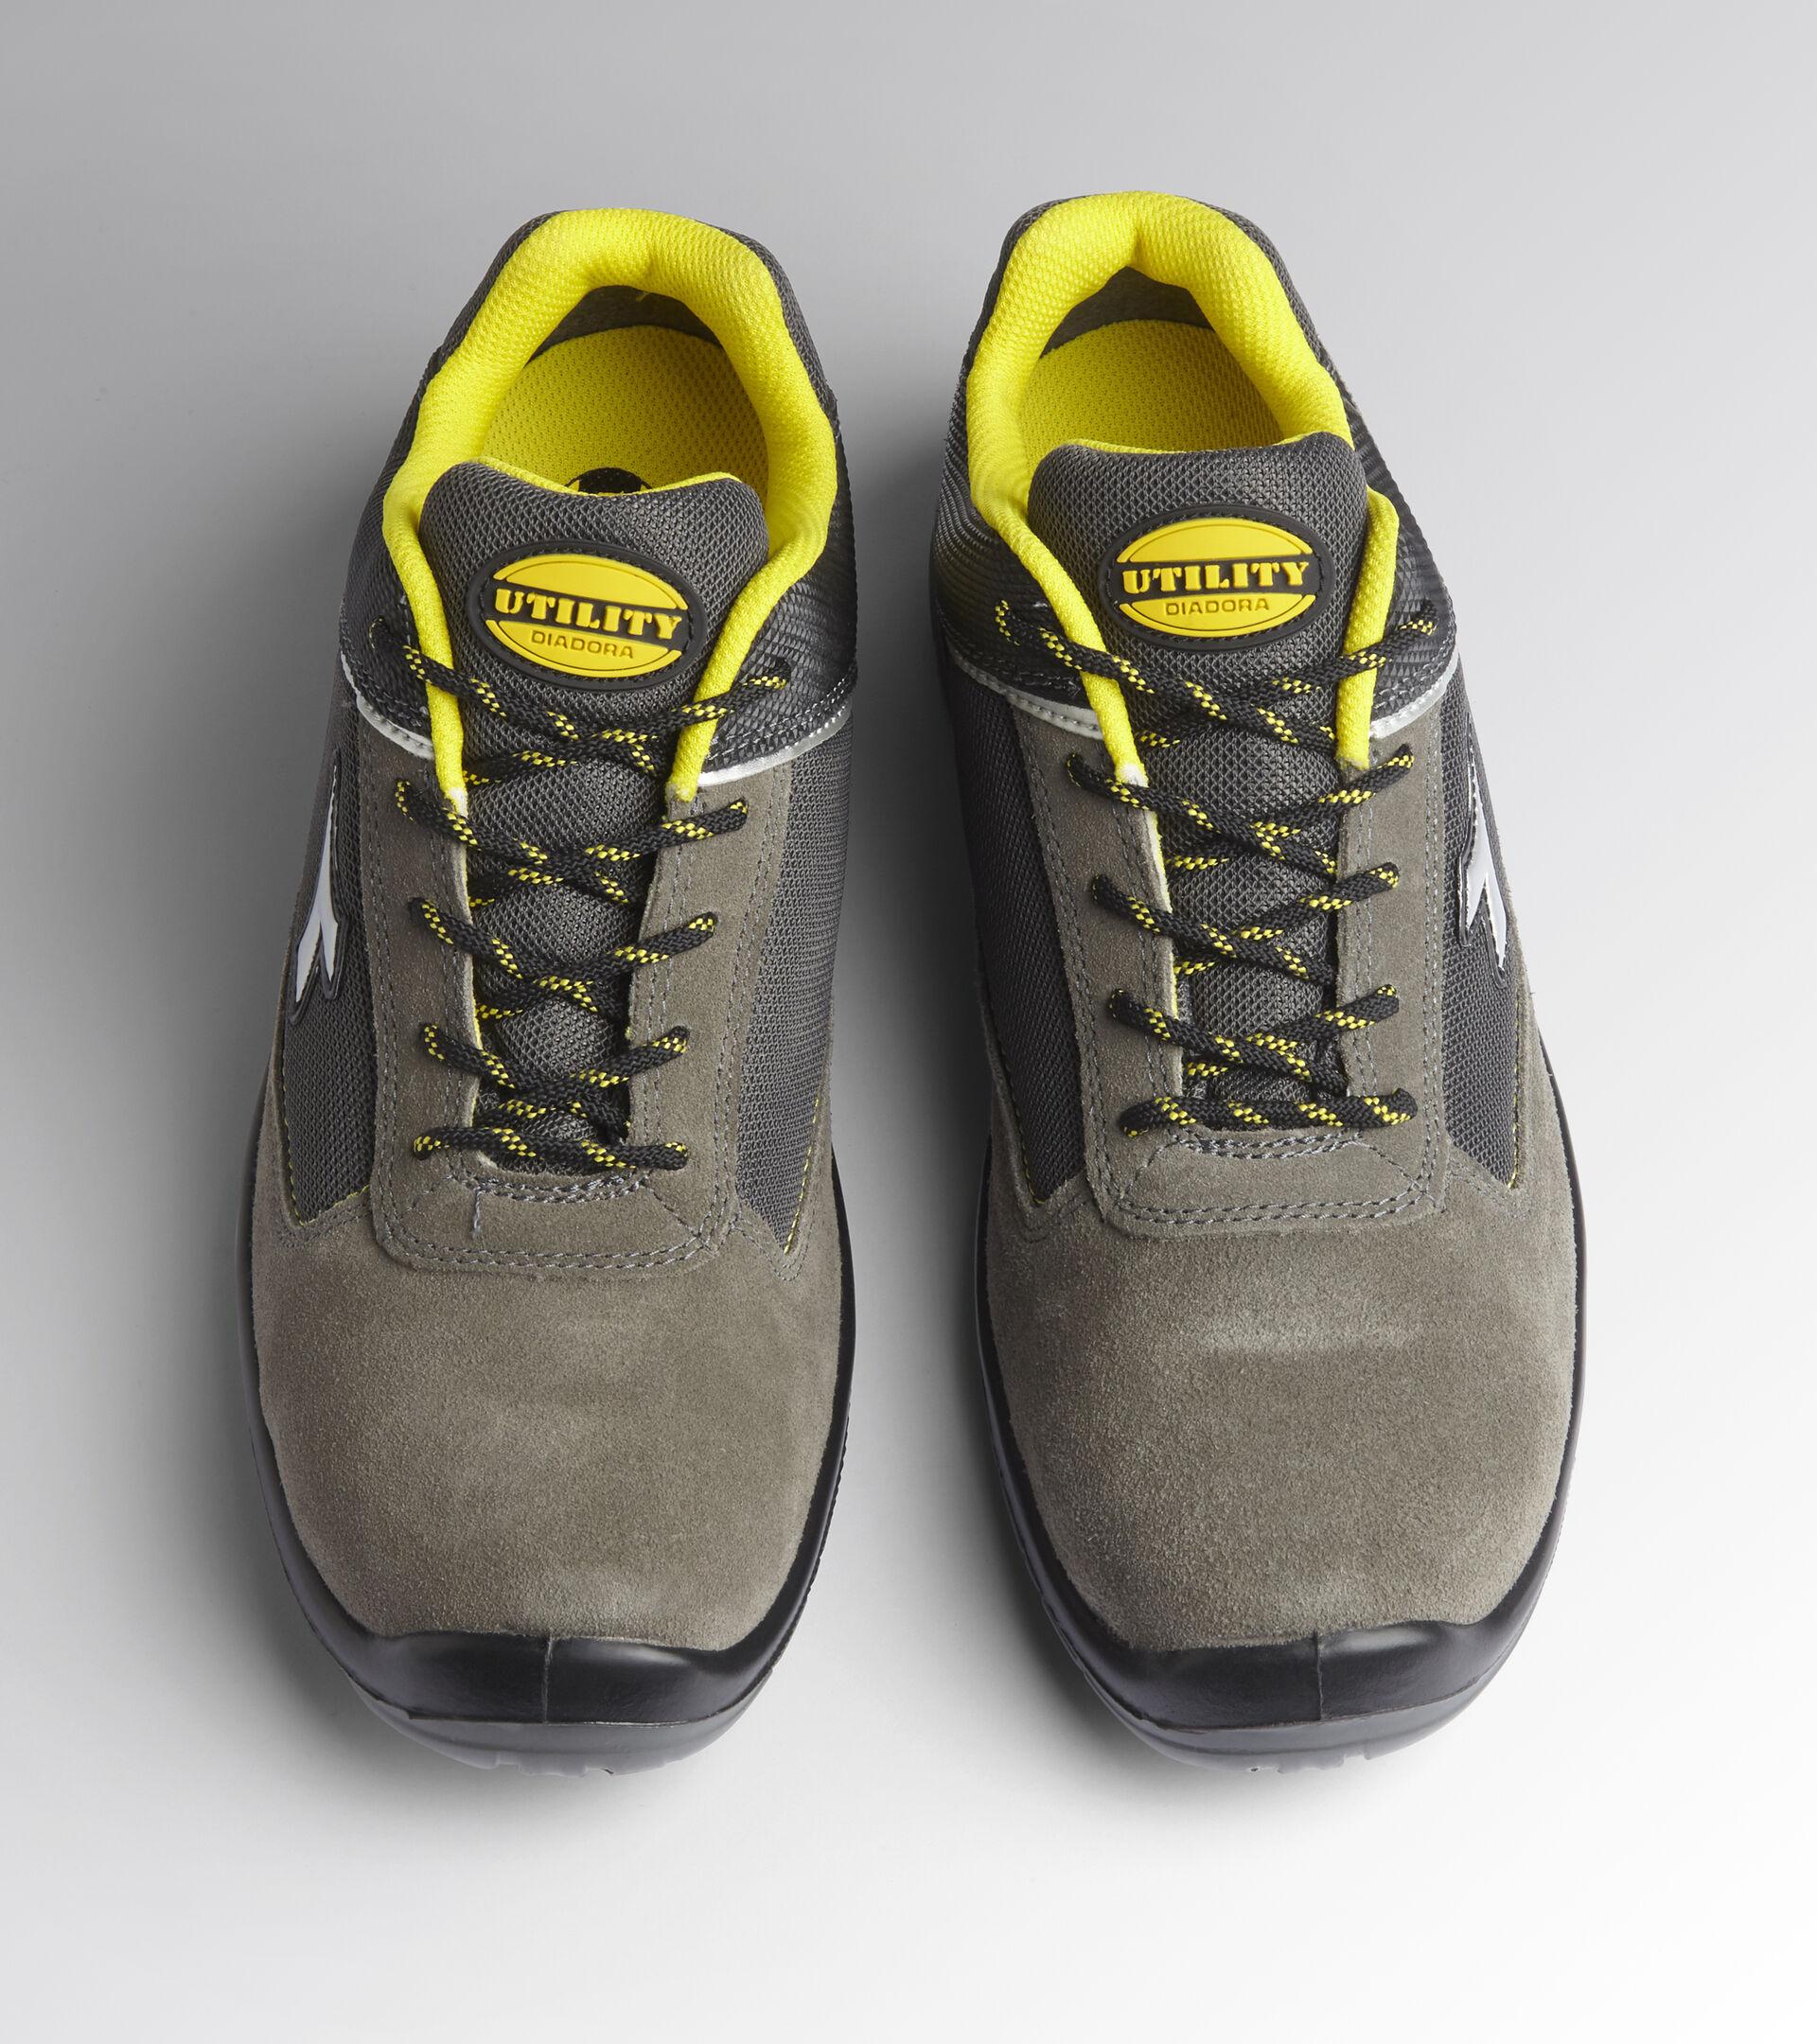 Footwear Utility UNISEX BLITZ LOW S1P SRC SCHLOSSSTEIN Utility